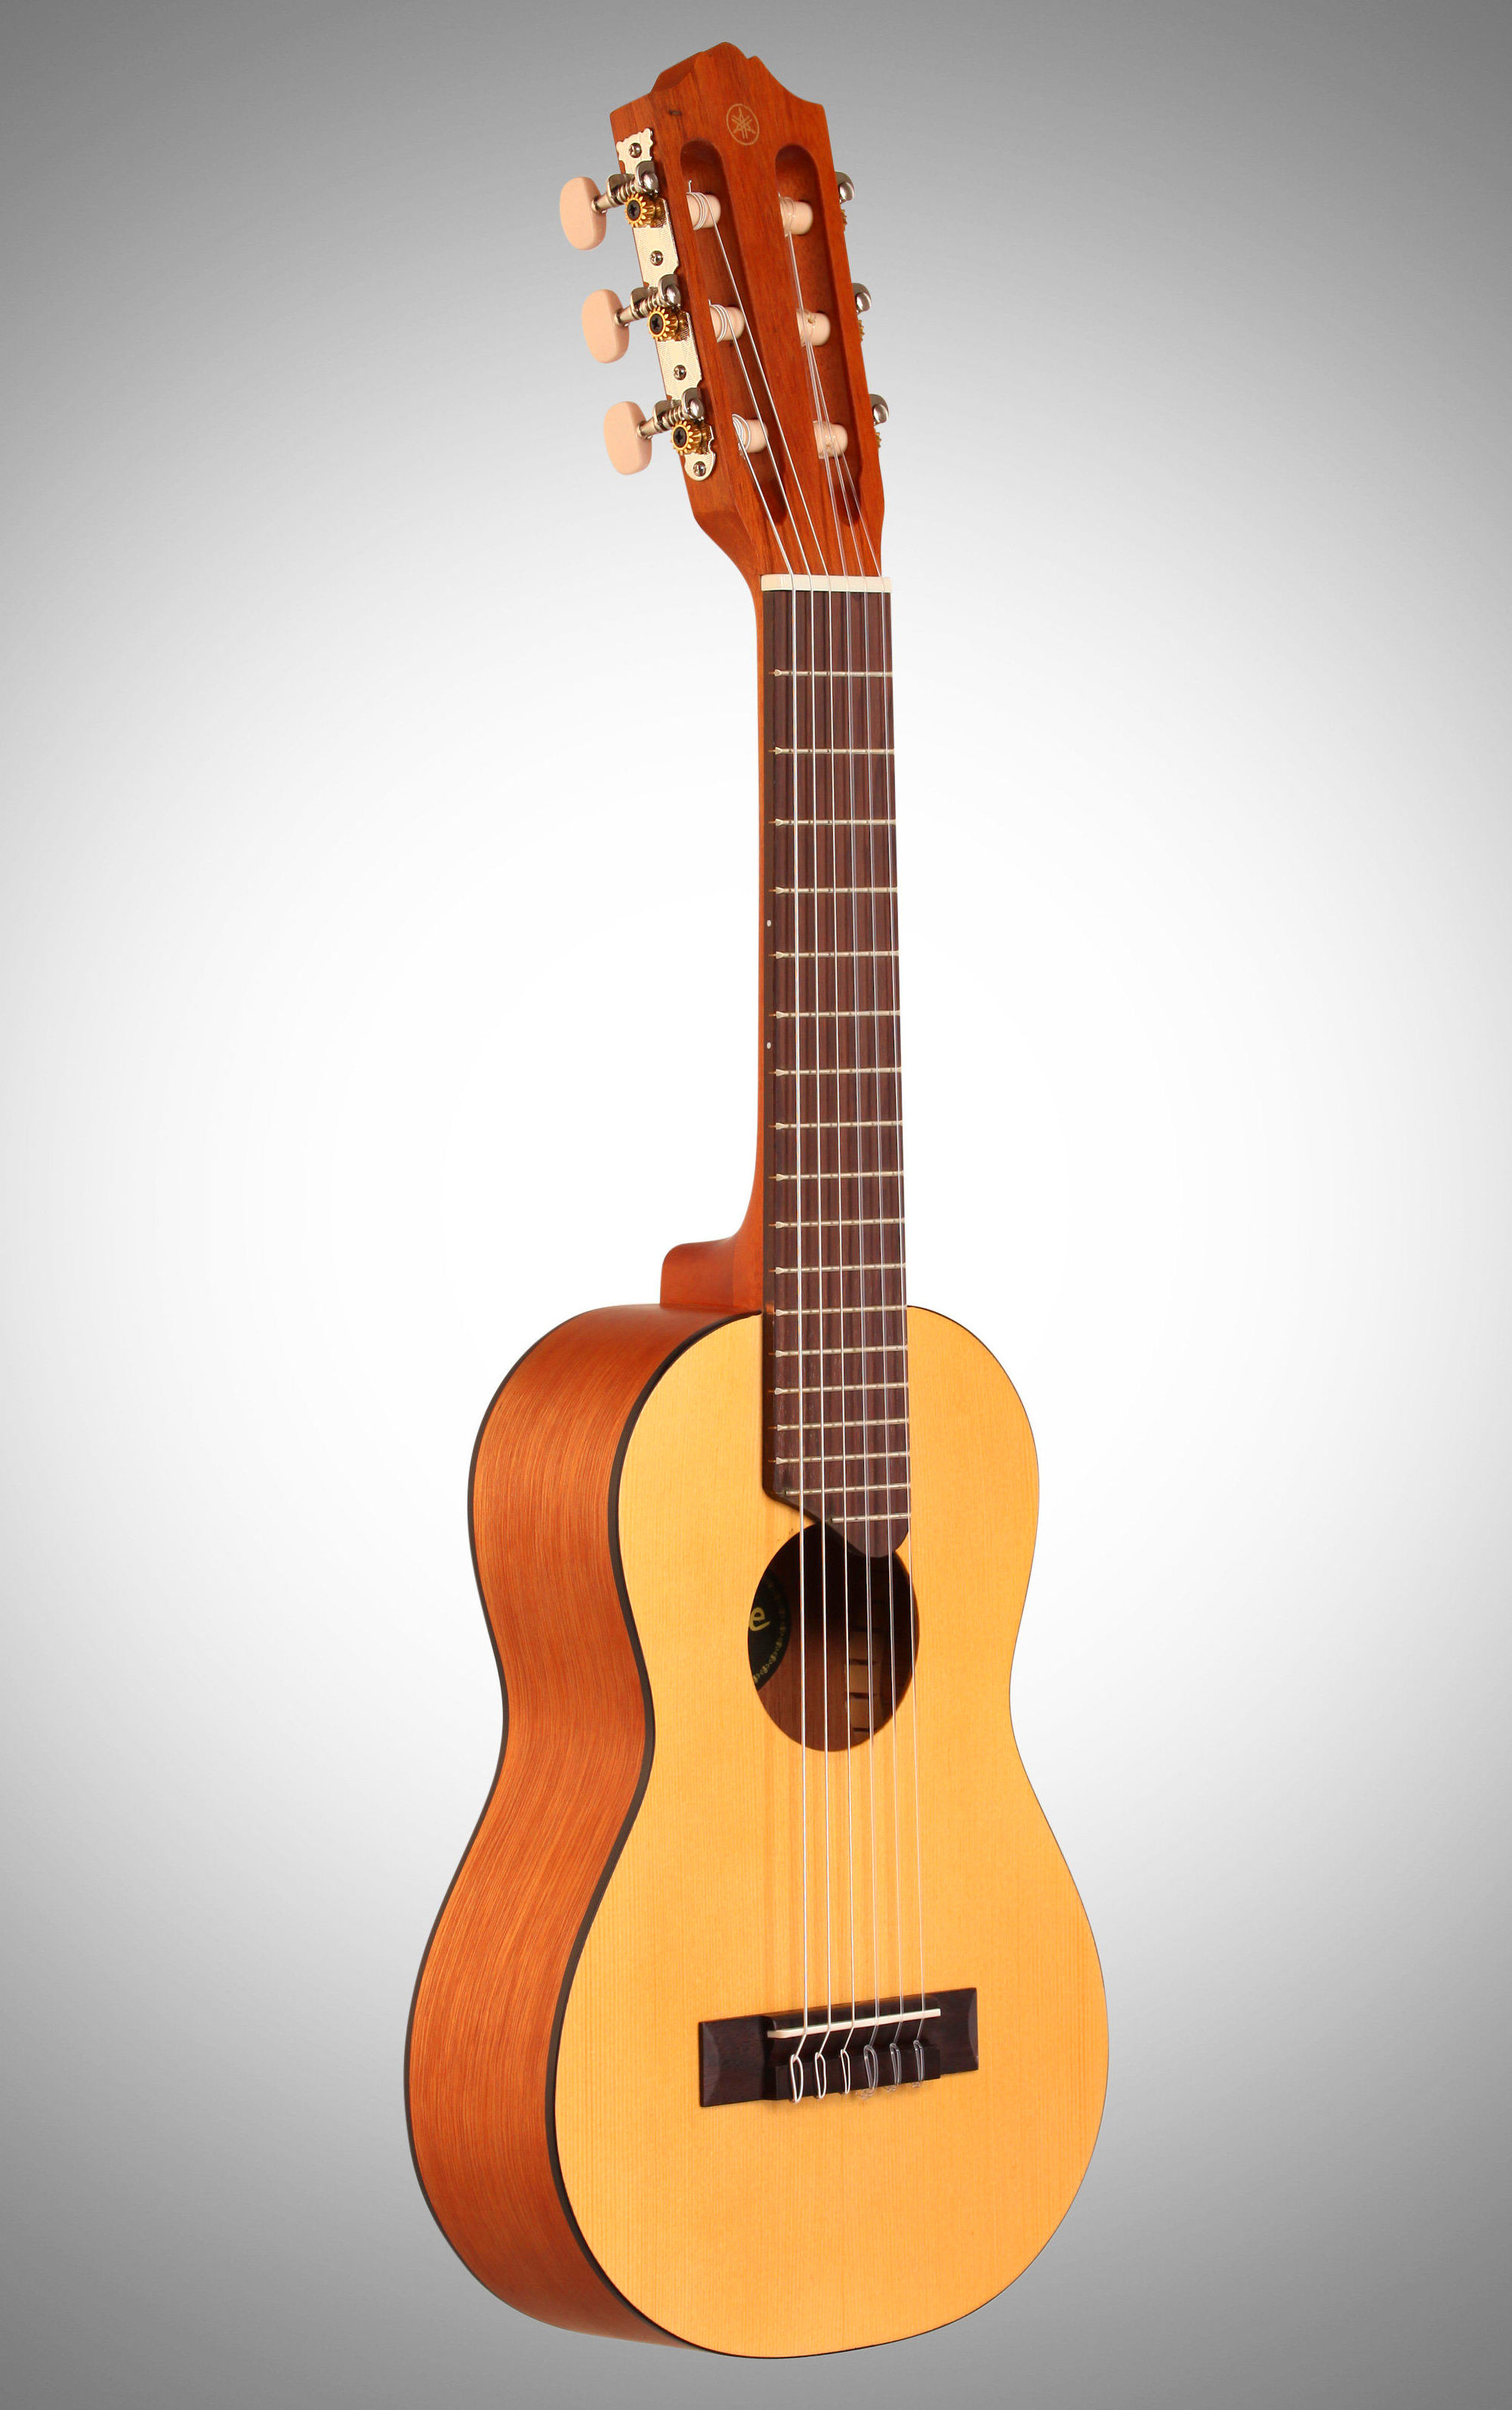 Guitarlele Yamaha Amplificado